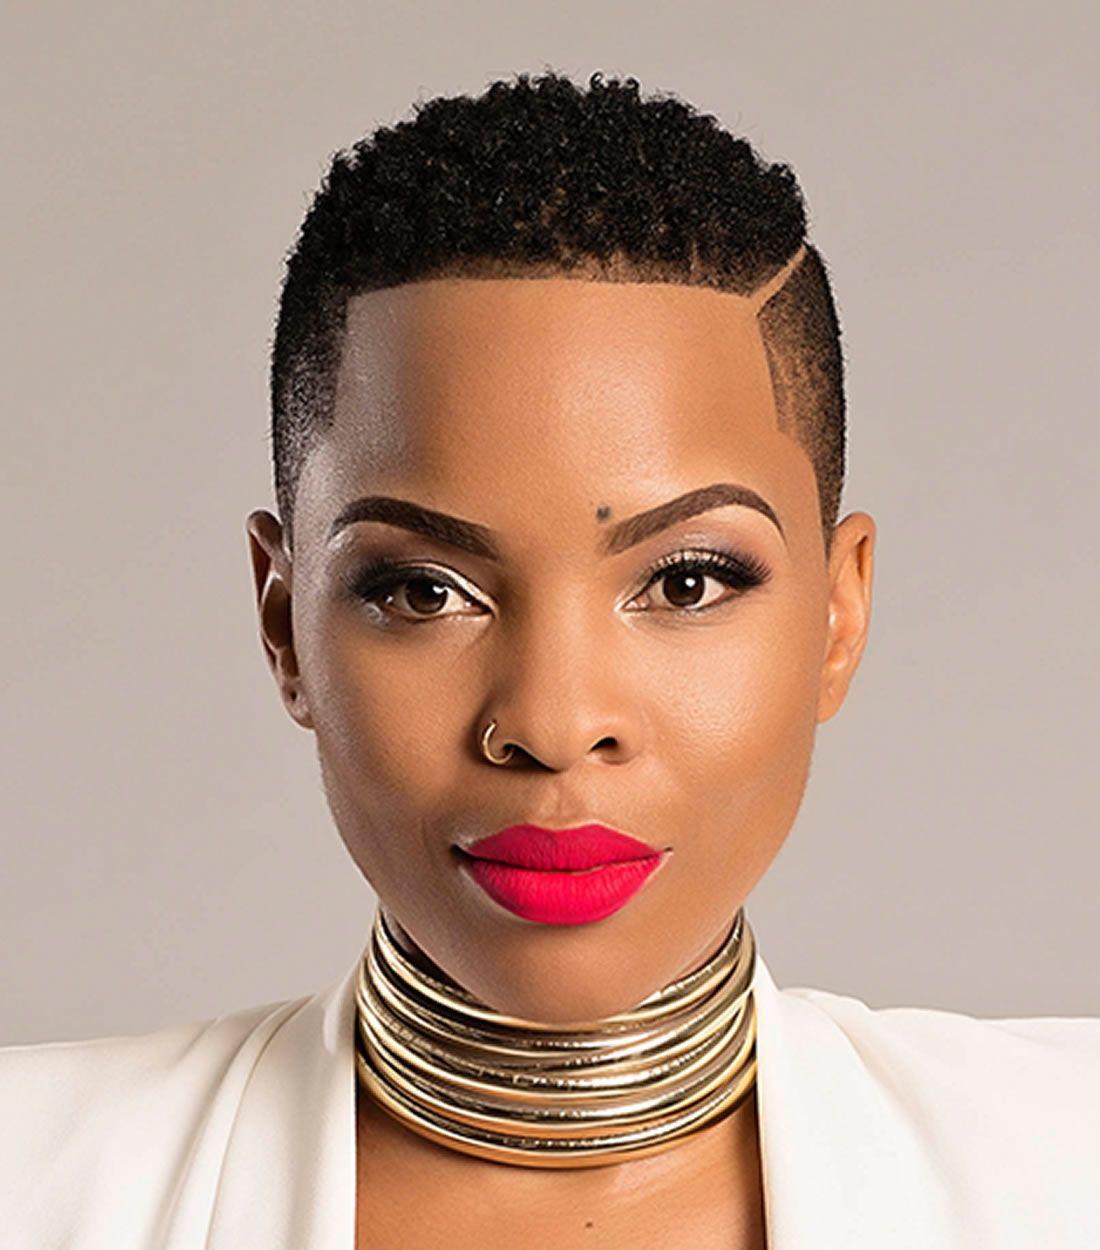 32 Exquisite Afroamerikaner Kurze Frisuren Und Frisuren Fur 2018